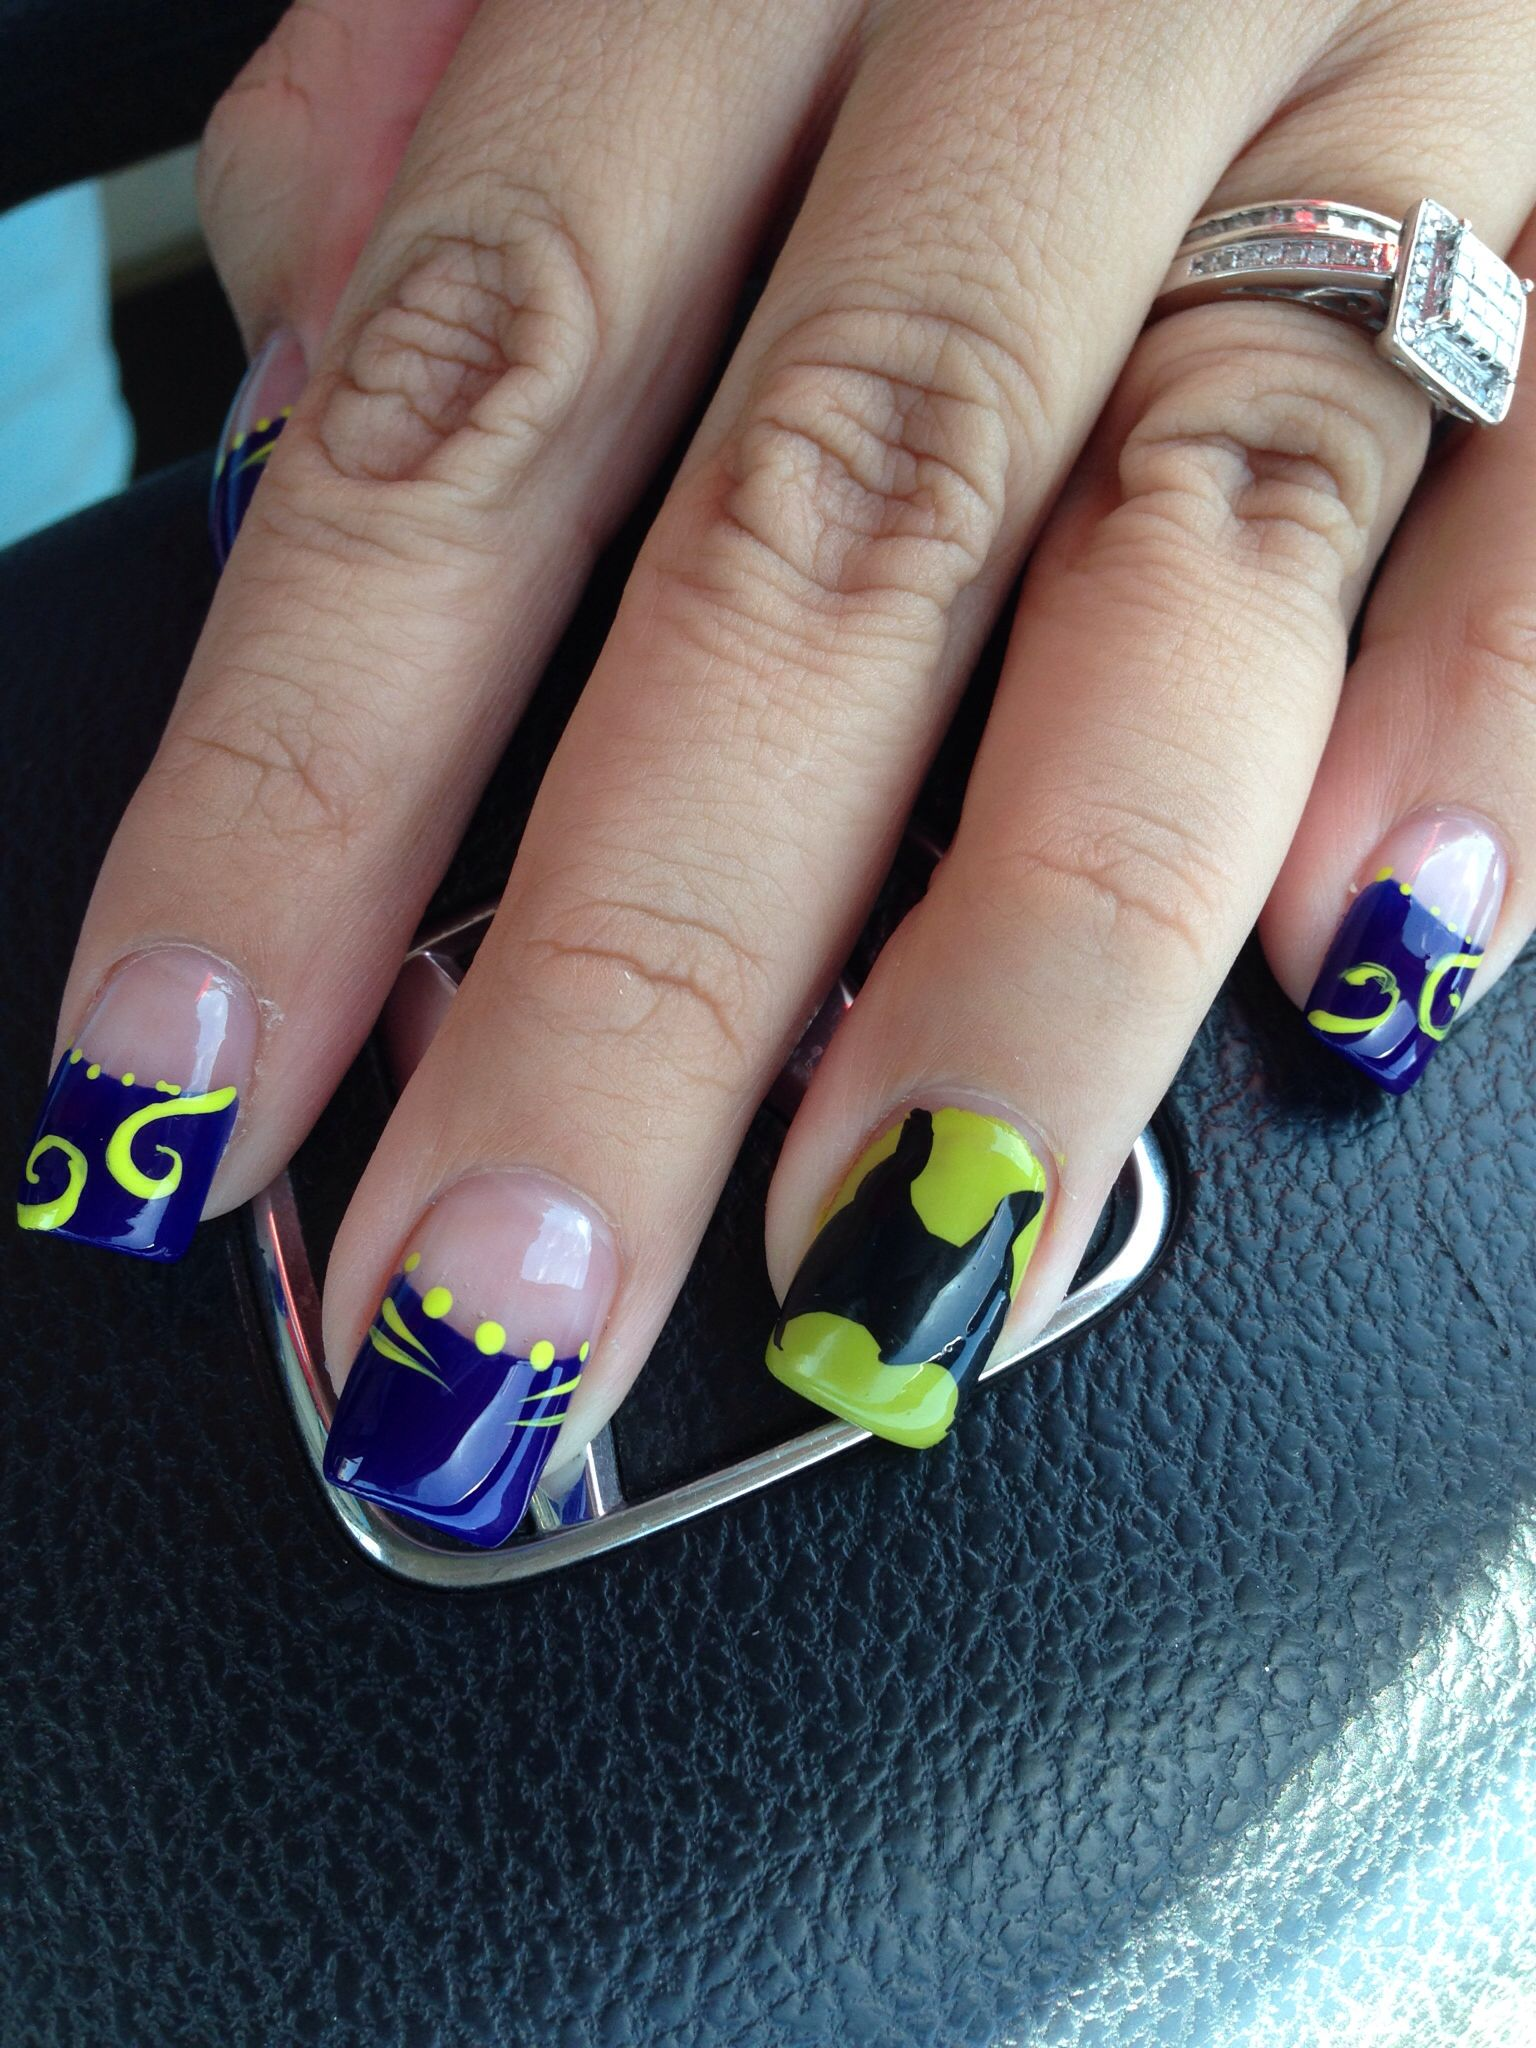 Maleficent nails | MAKEUP, NAIL AND HAIR IDEAS | Pinterest